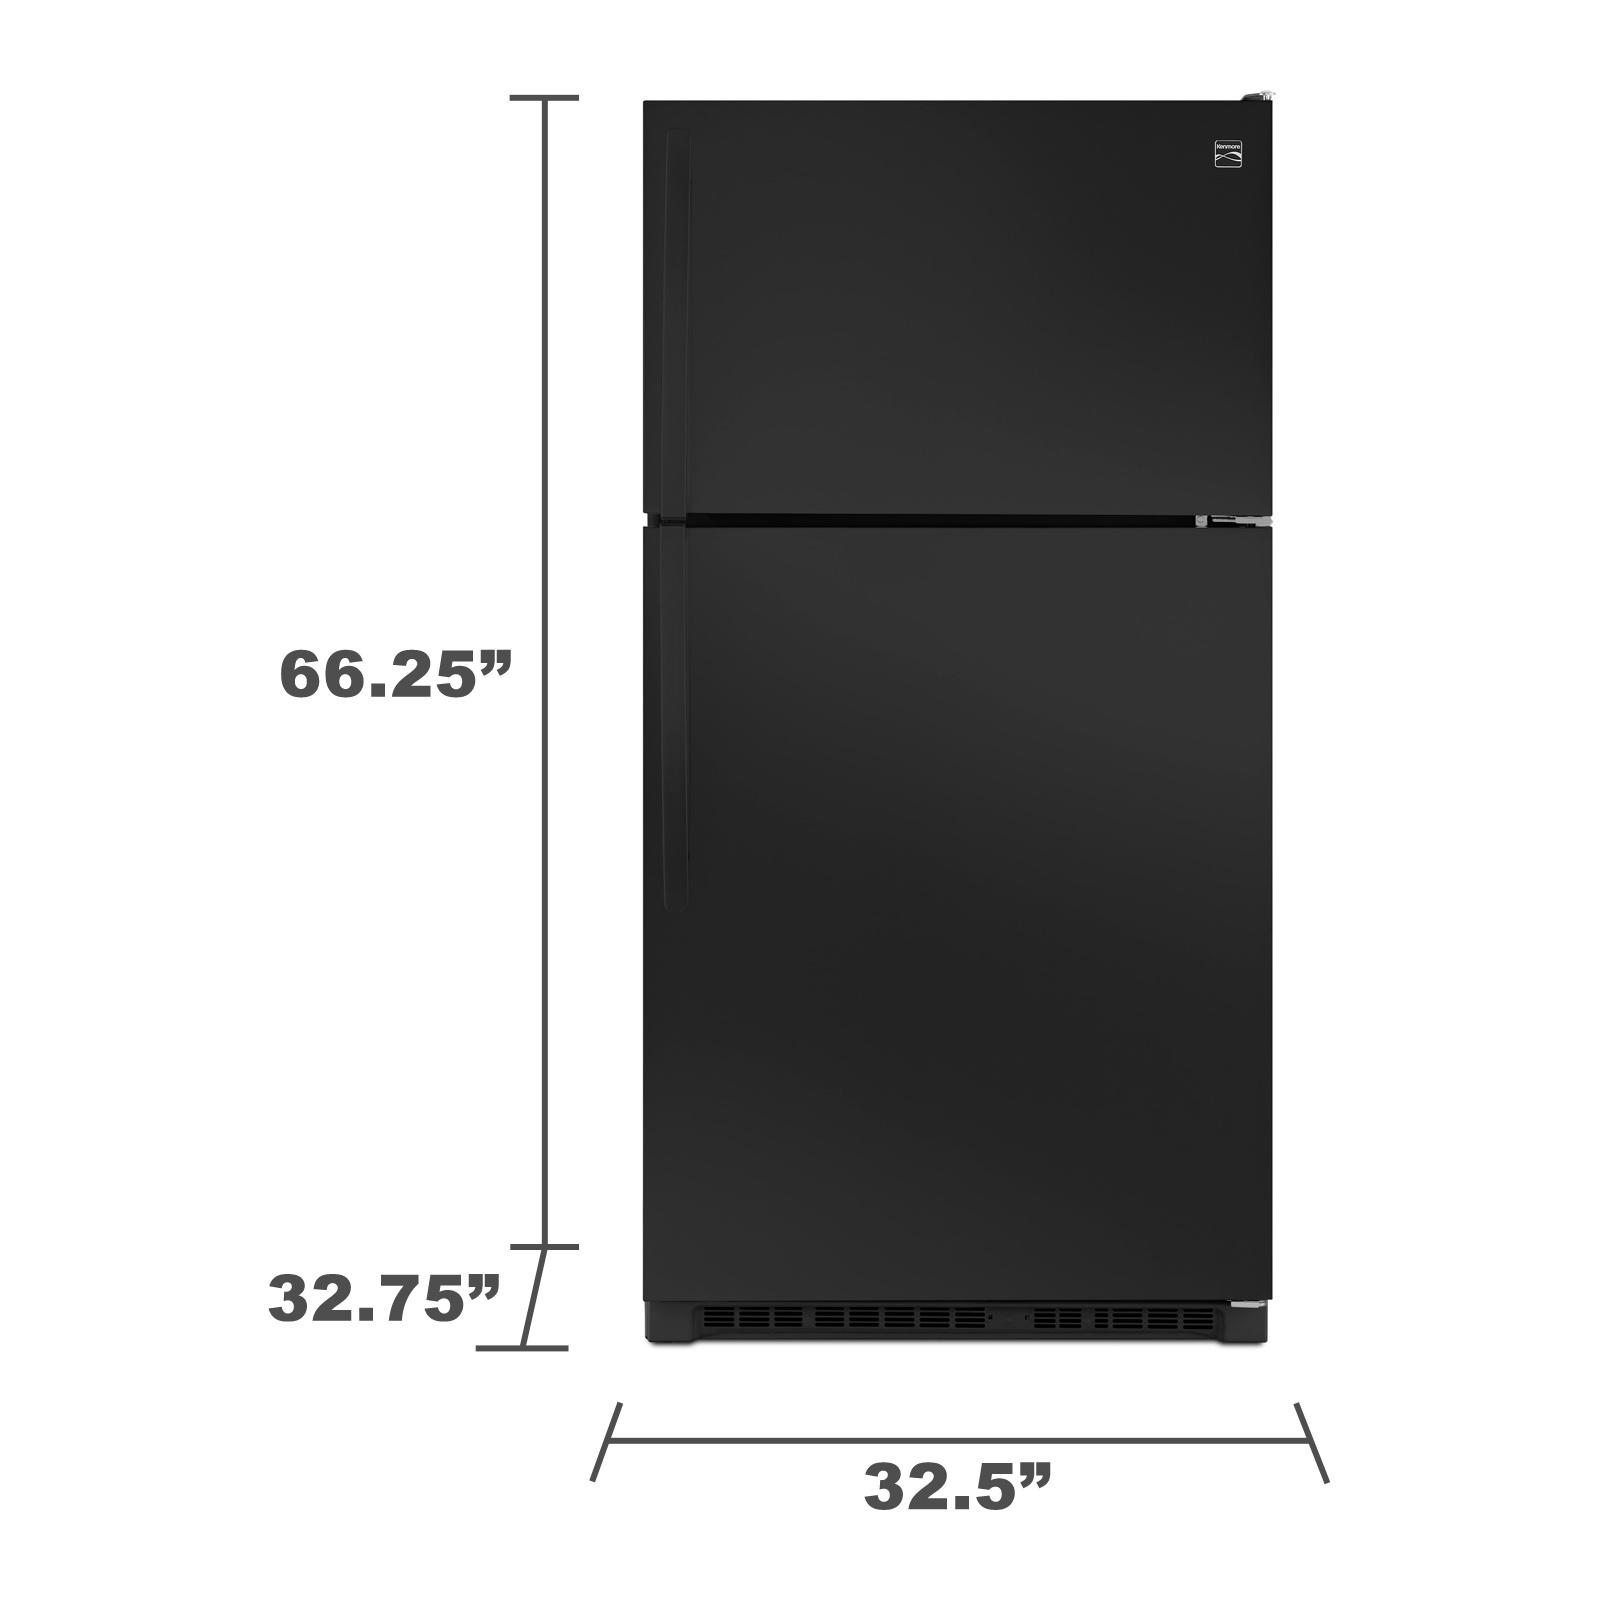 Kenmore 60219 20.5 cu. ft. Top Freezer Refrigerator w/ Humidity-Controlled Crispers - Black